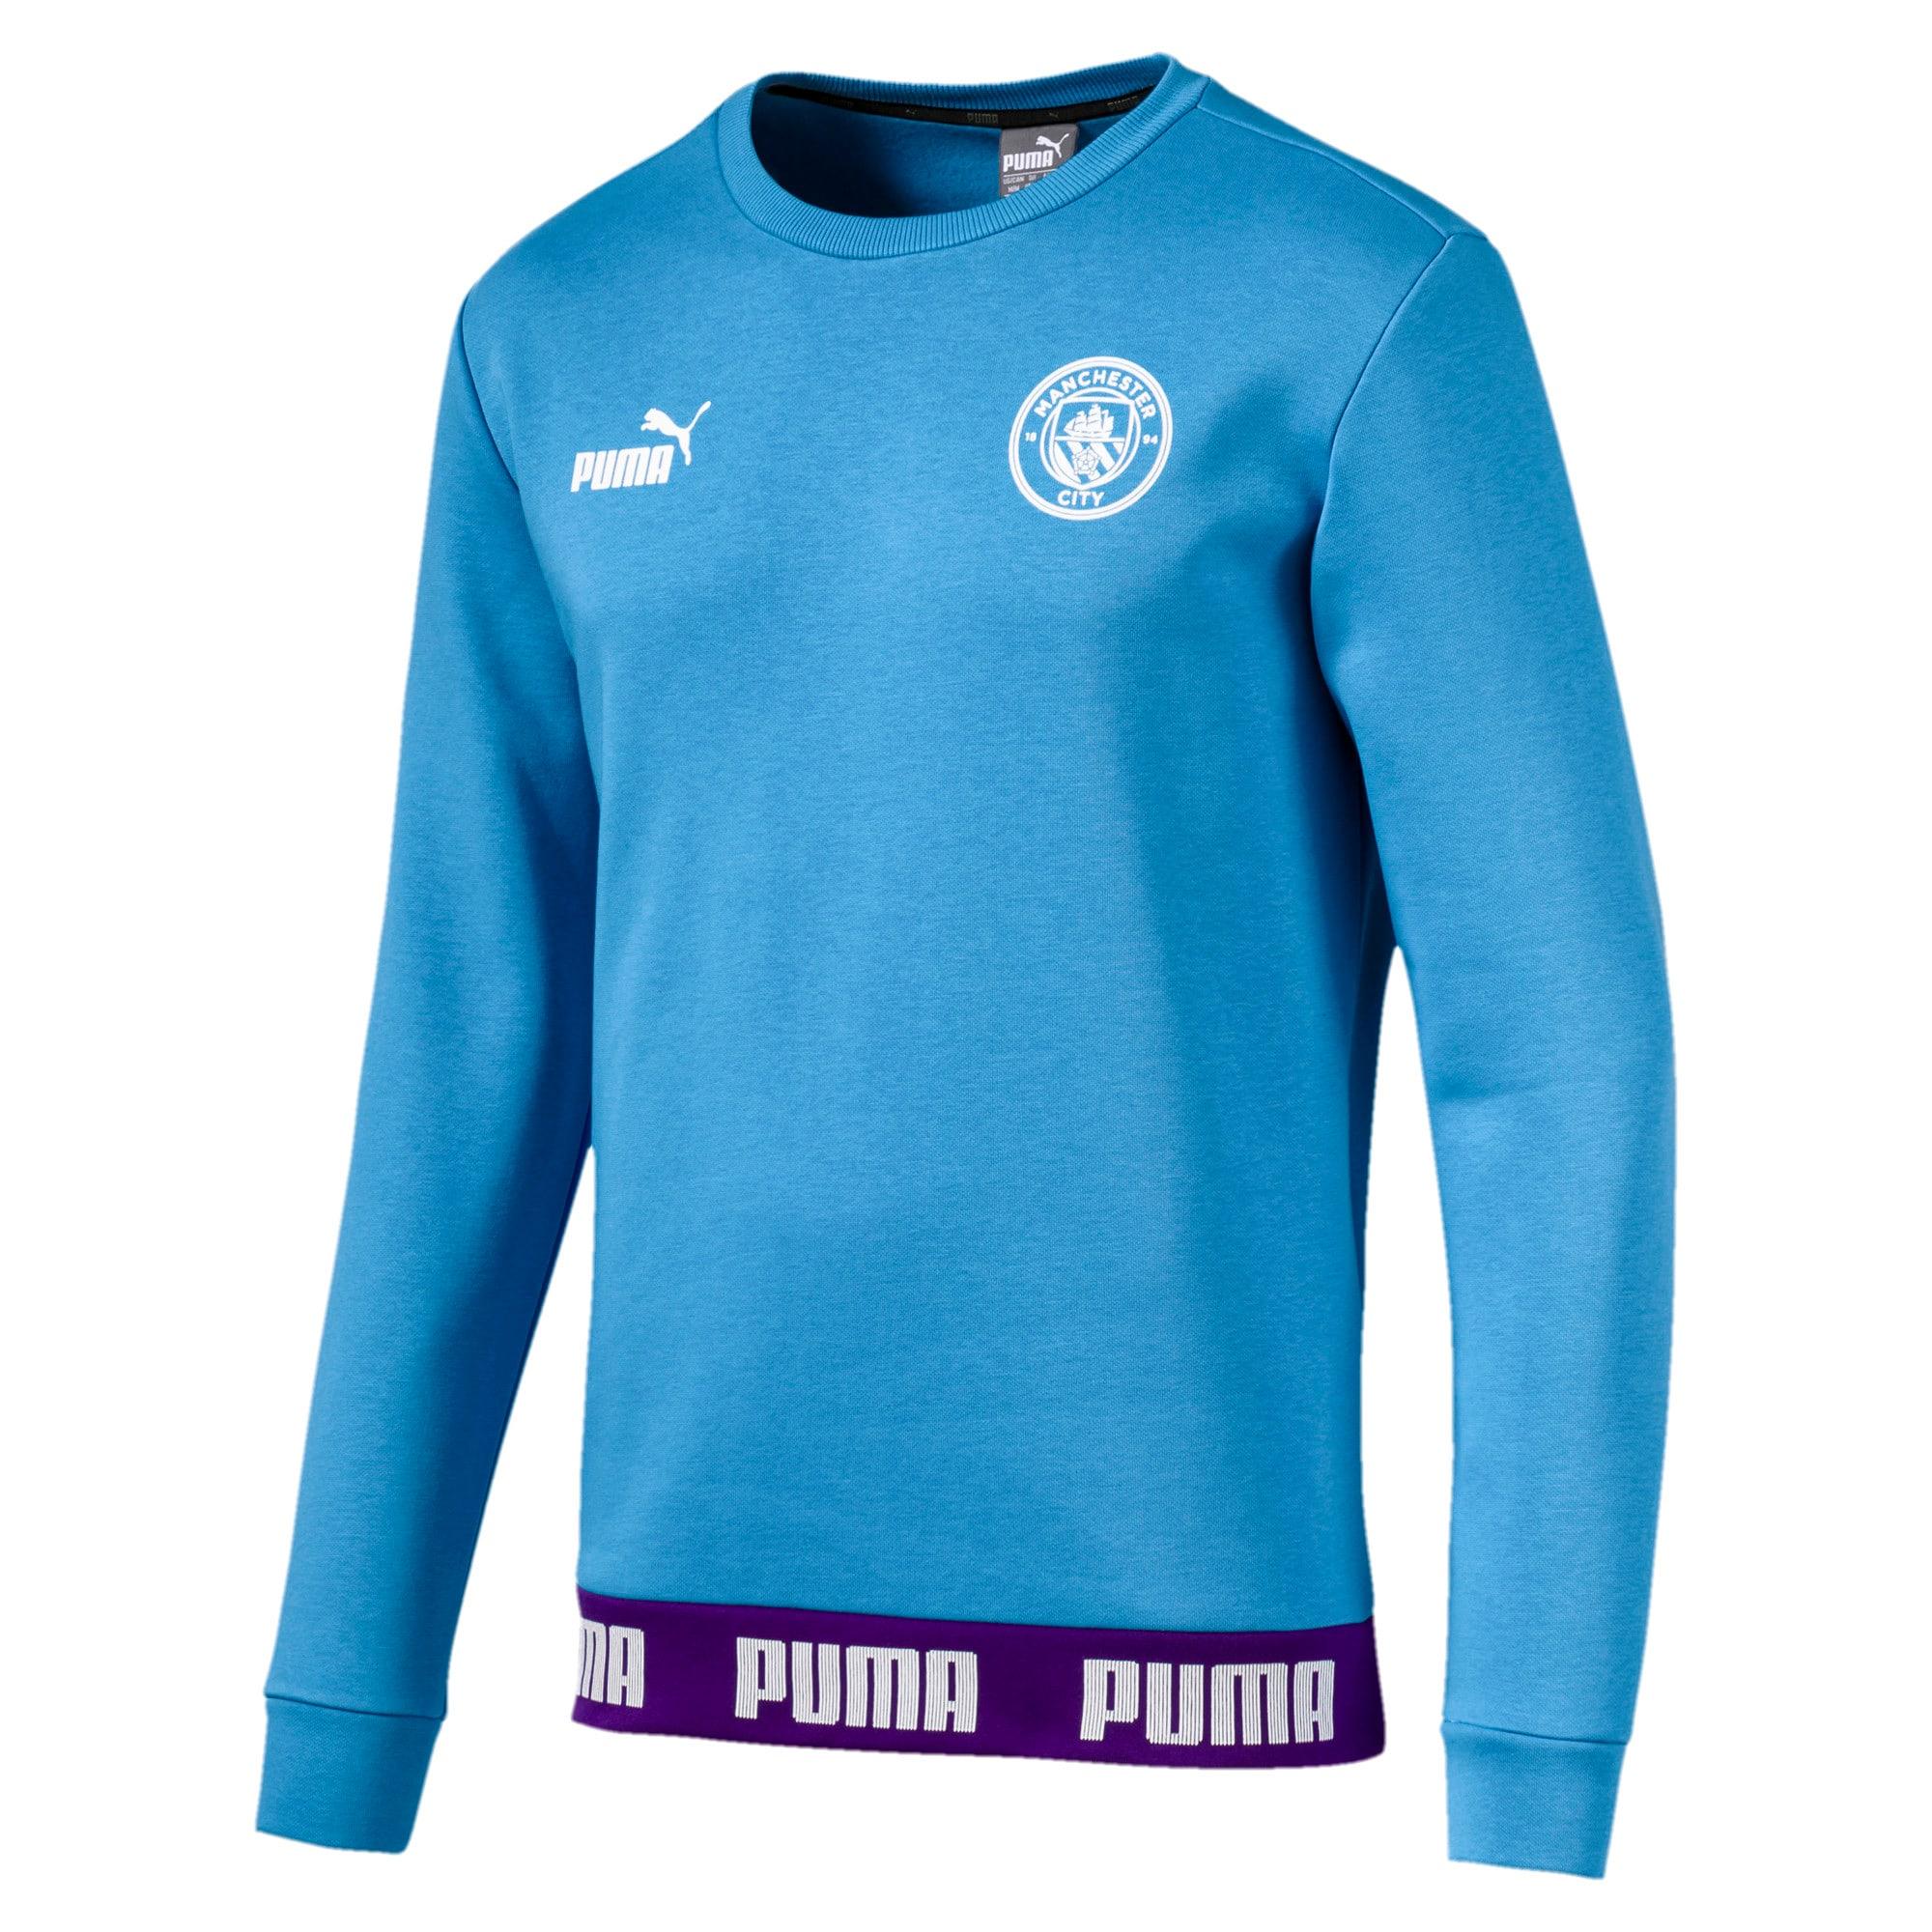 Thumbnail 4 of Manchester City FC FtblCulture Men's Sweatshirt, Team Light Blue-Puma White, medium